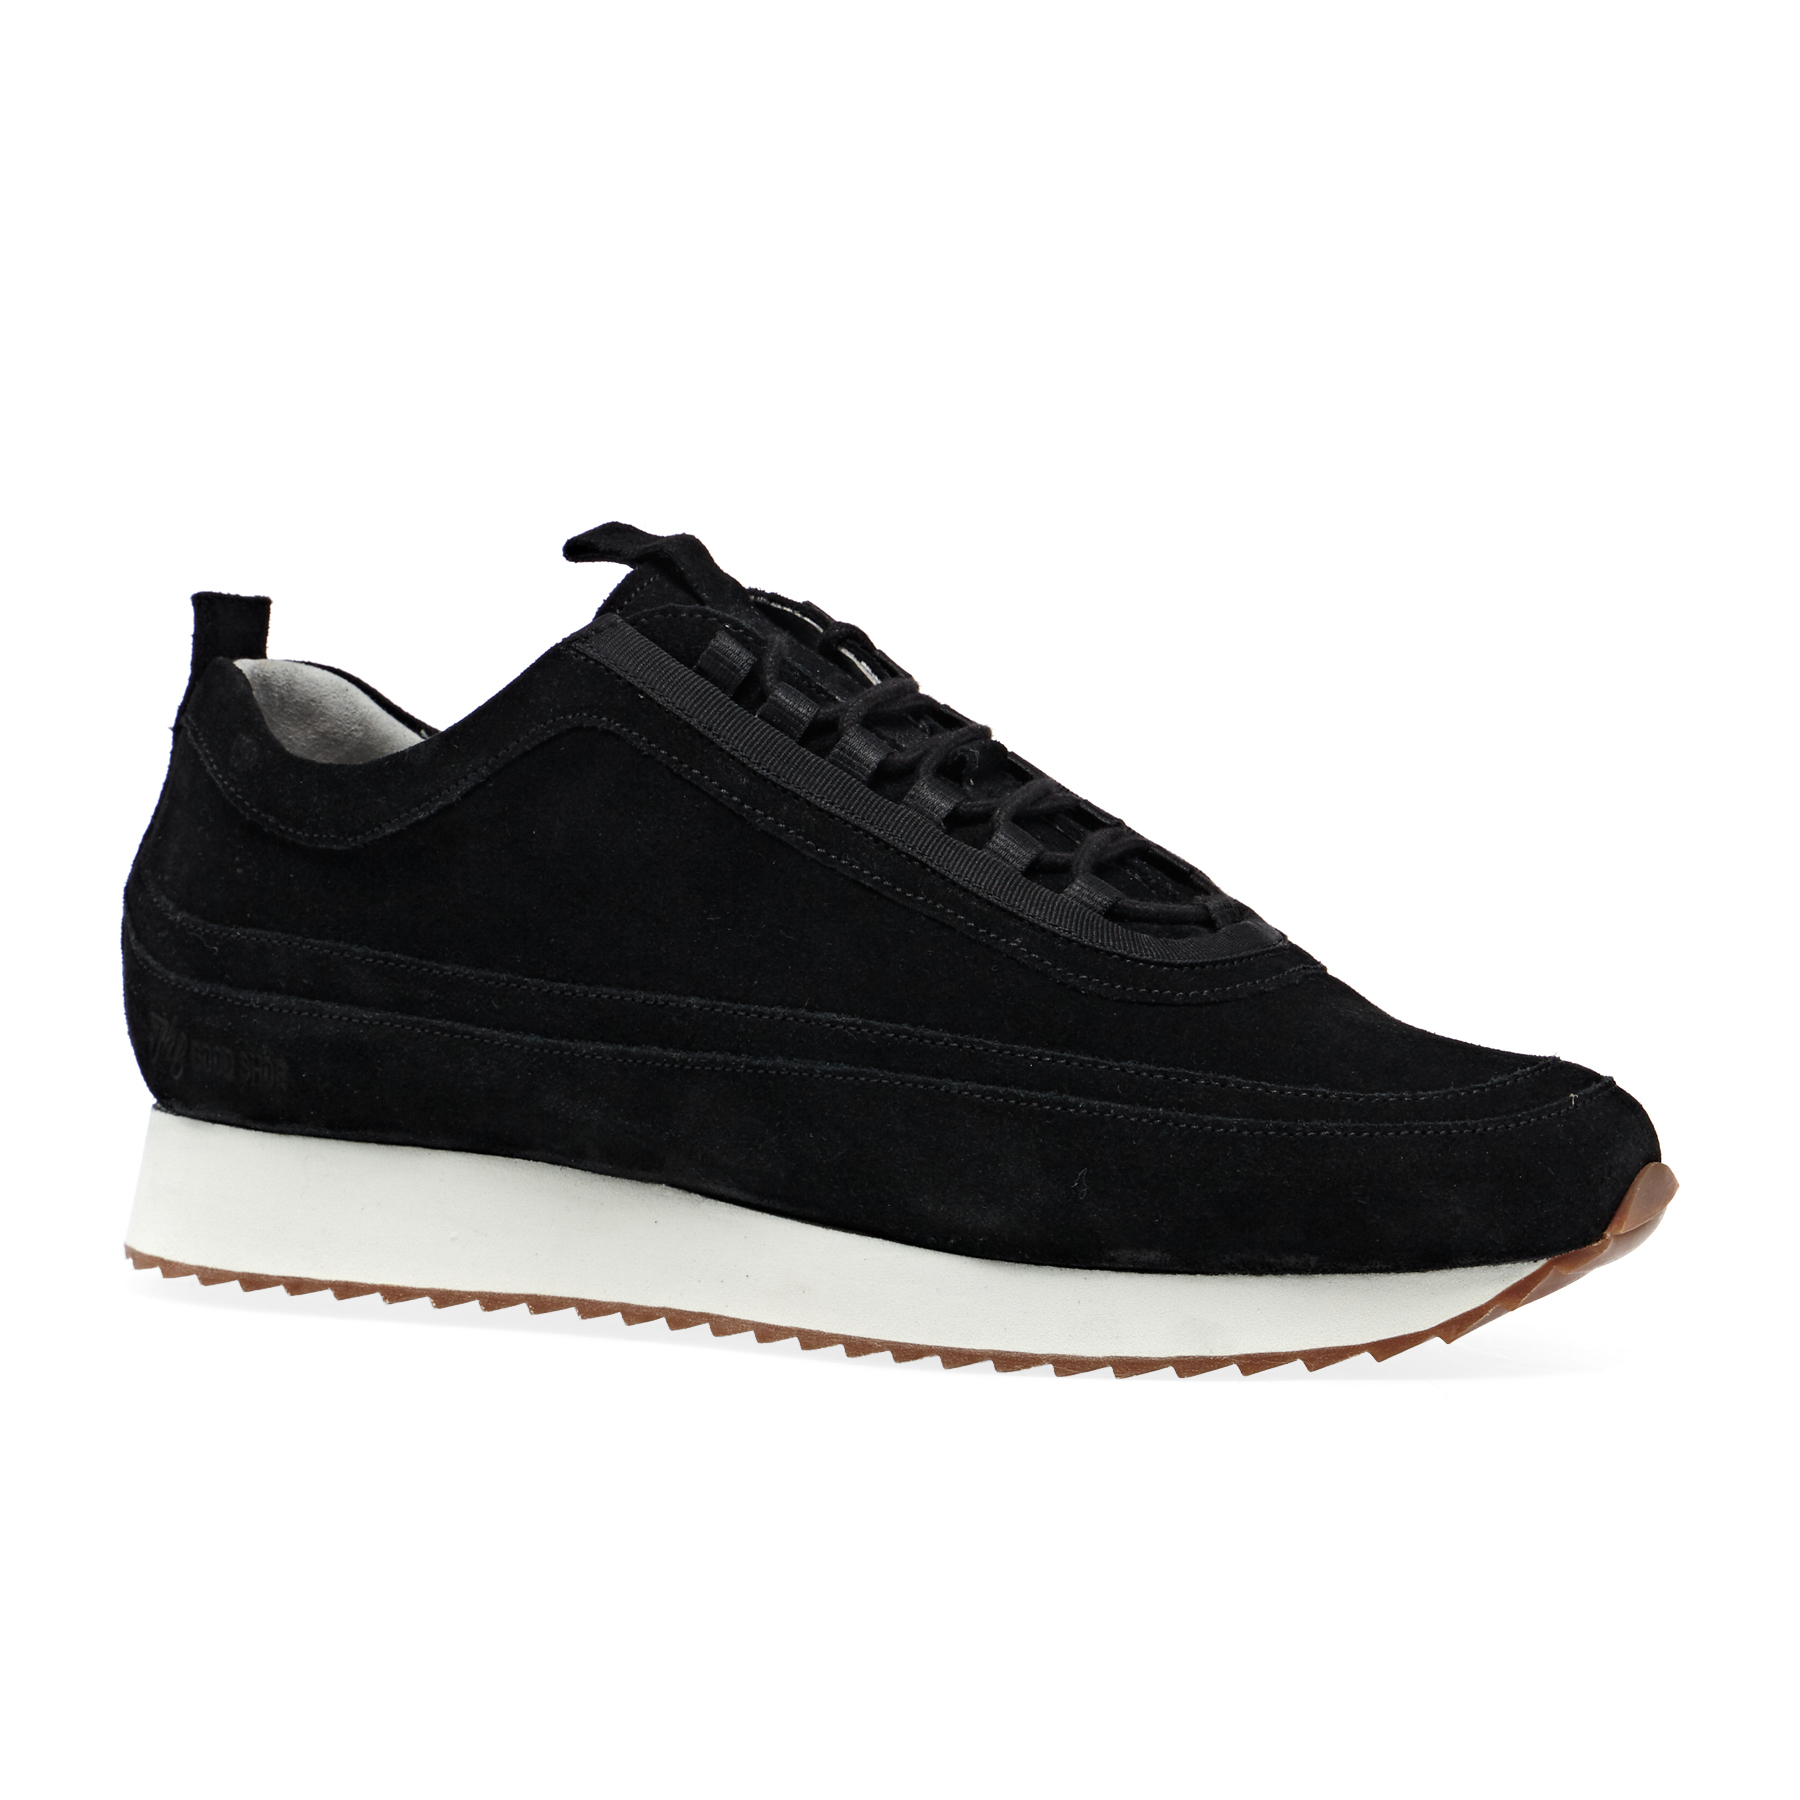 Grenson Sneaker 12 Men's Shoes - Black